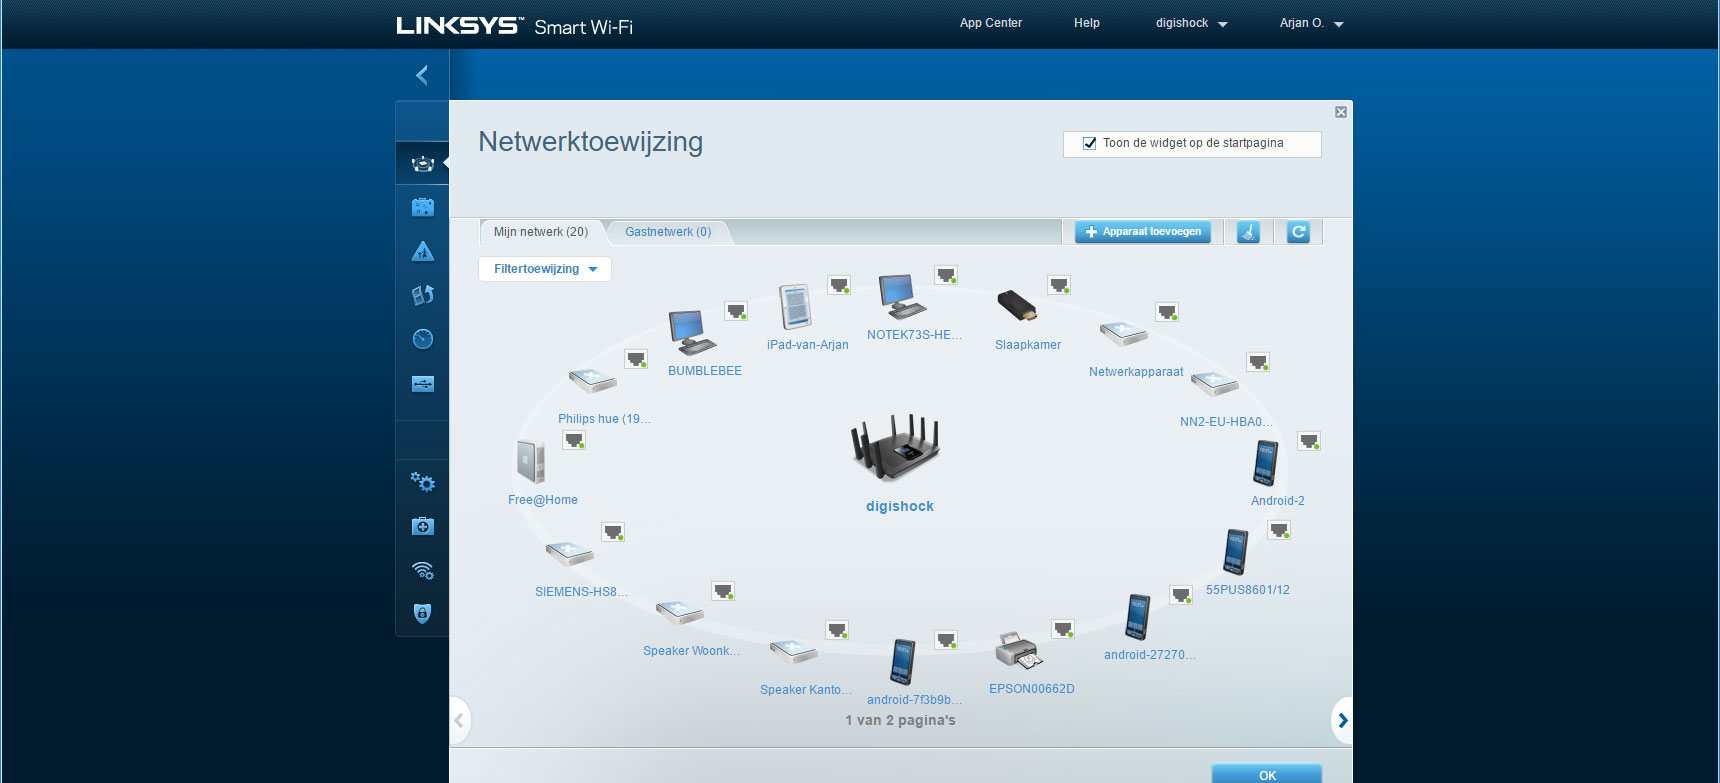 linksys-netwerktoewijzing